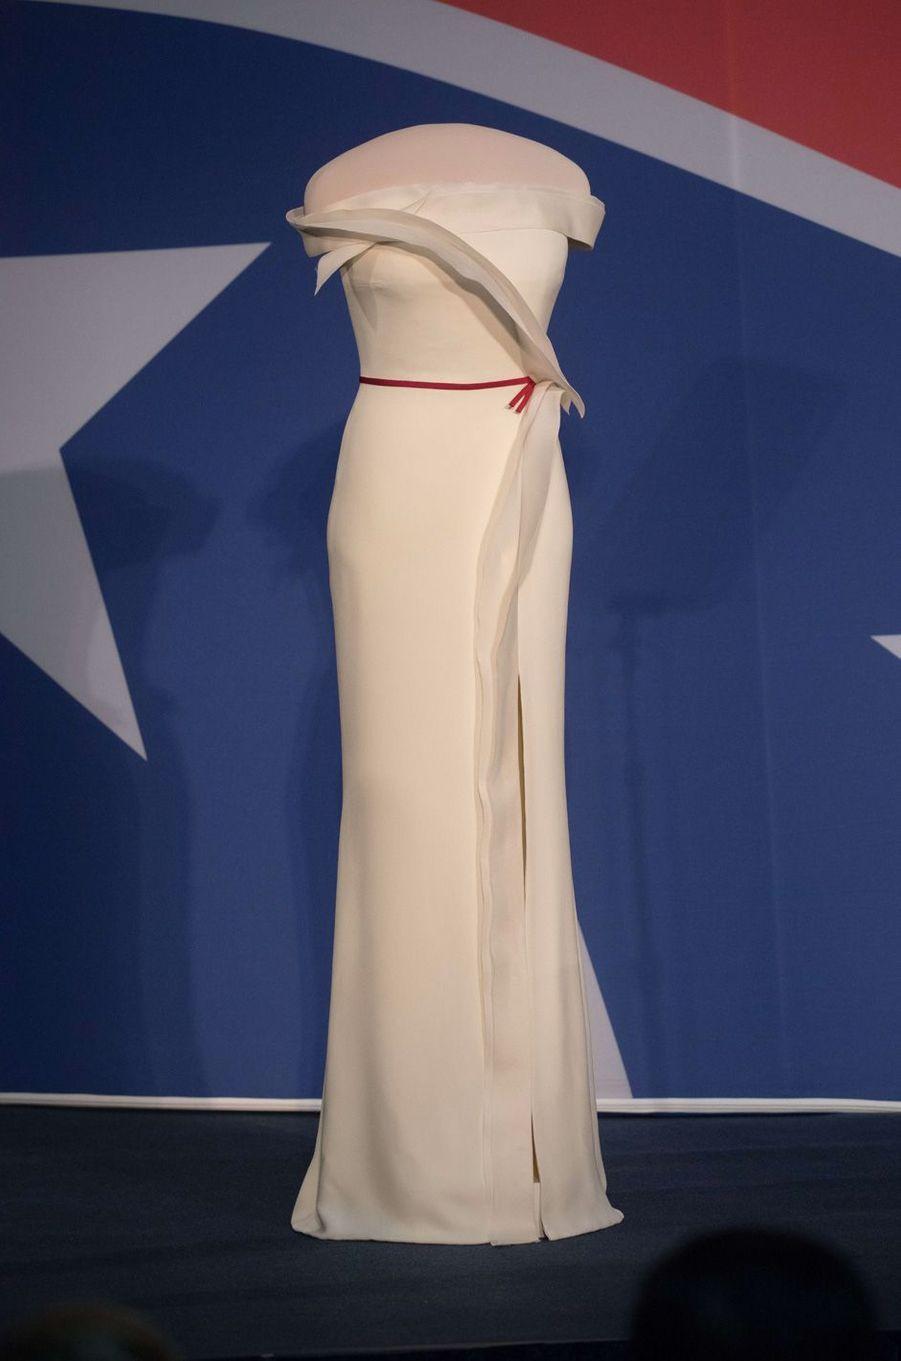 La robe deMelania Trump à Washington, le 20 octobre 2017.